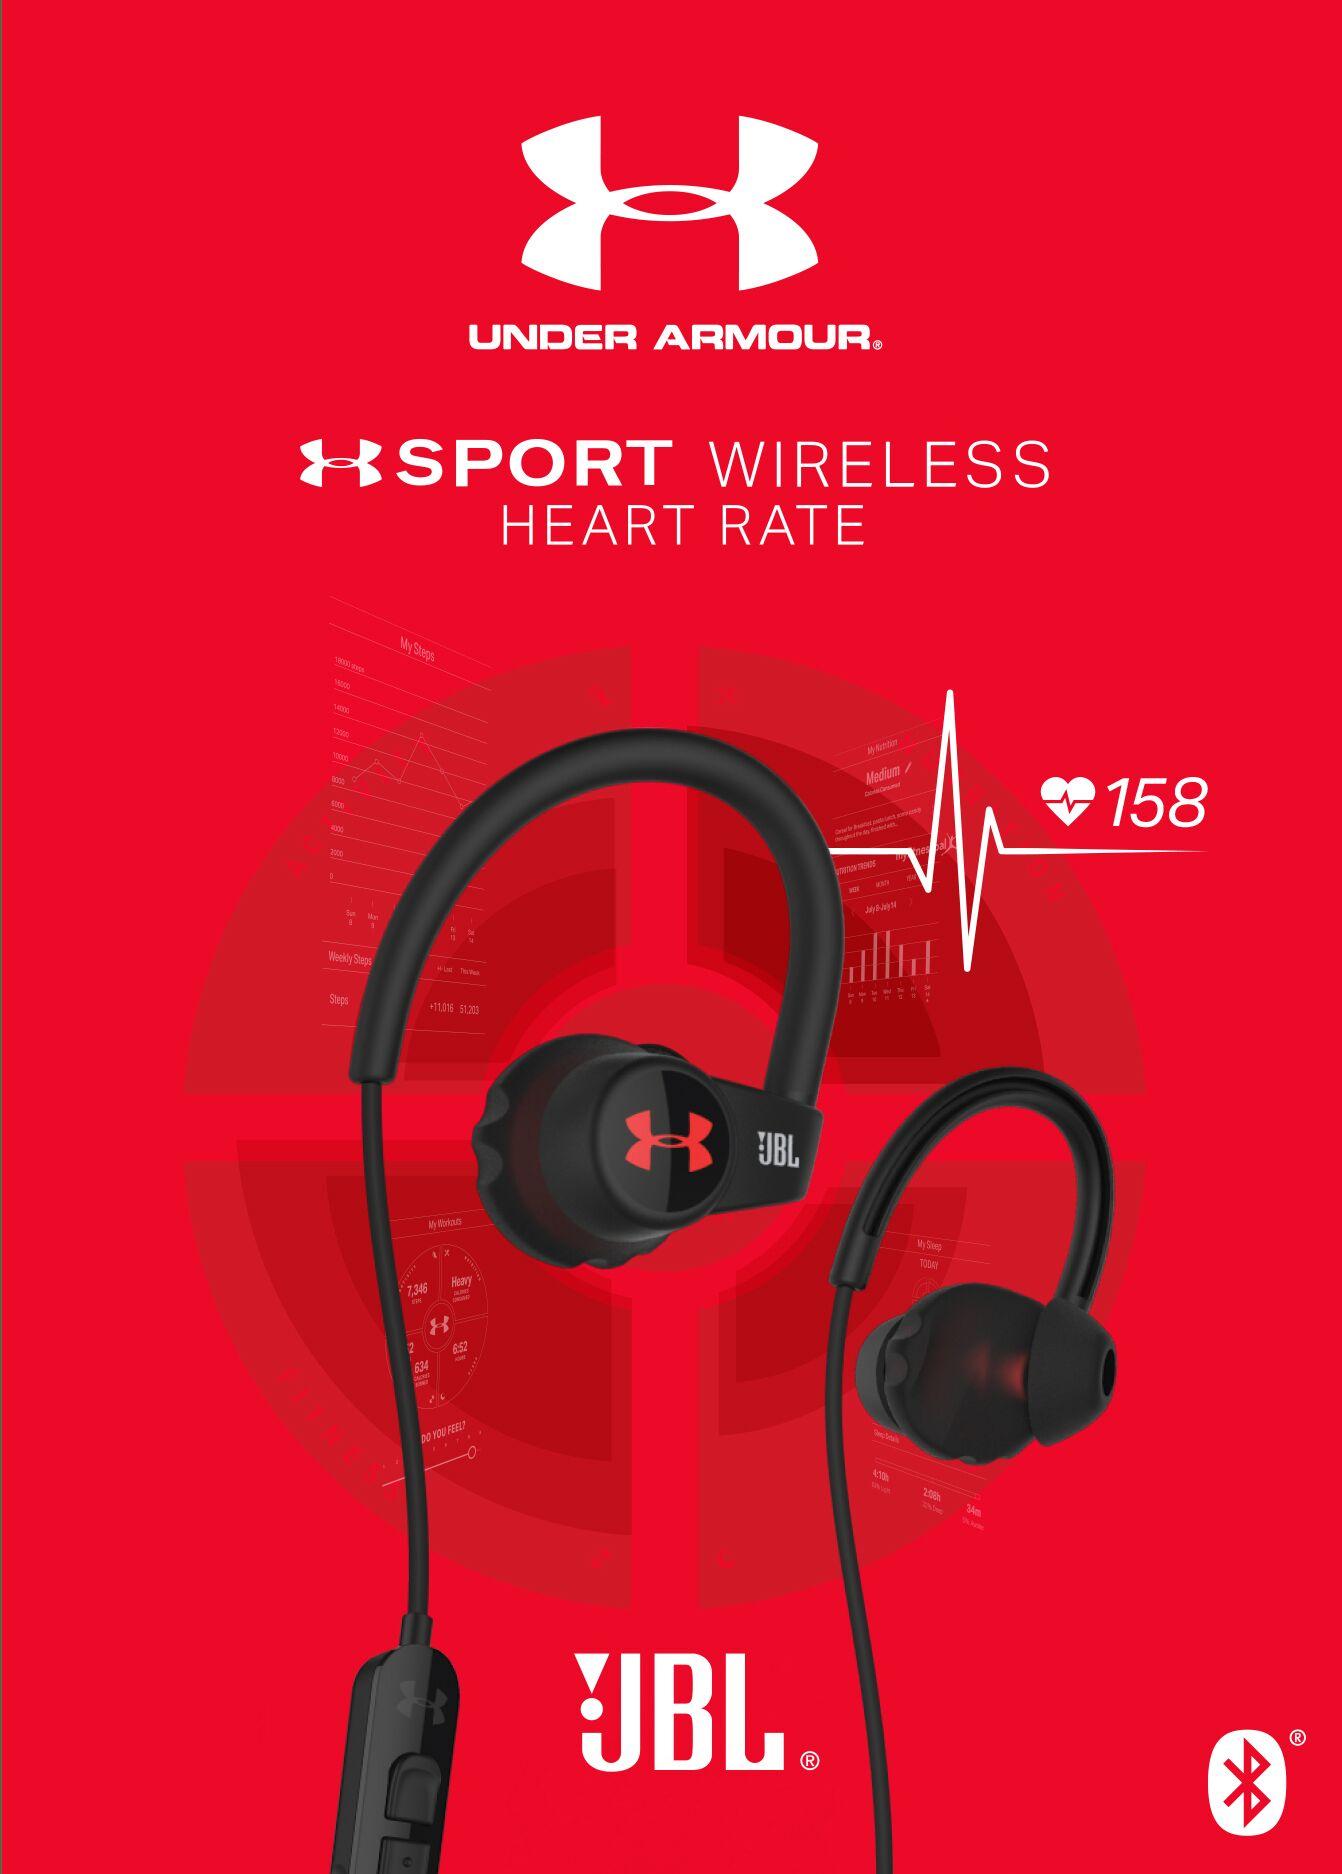 jbl under armour wireless headphones. ua-jbl-headphones.jpg jbl under armour wireless headphones n